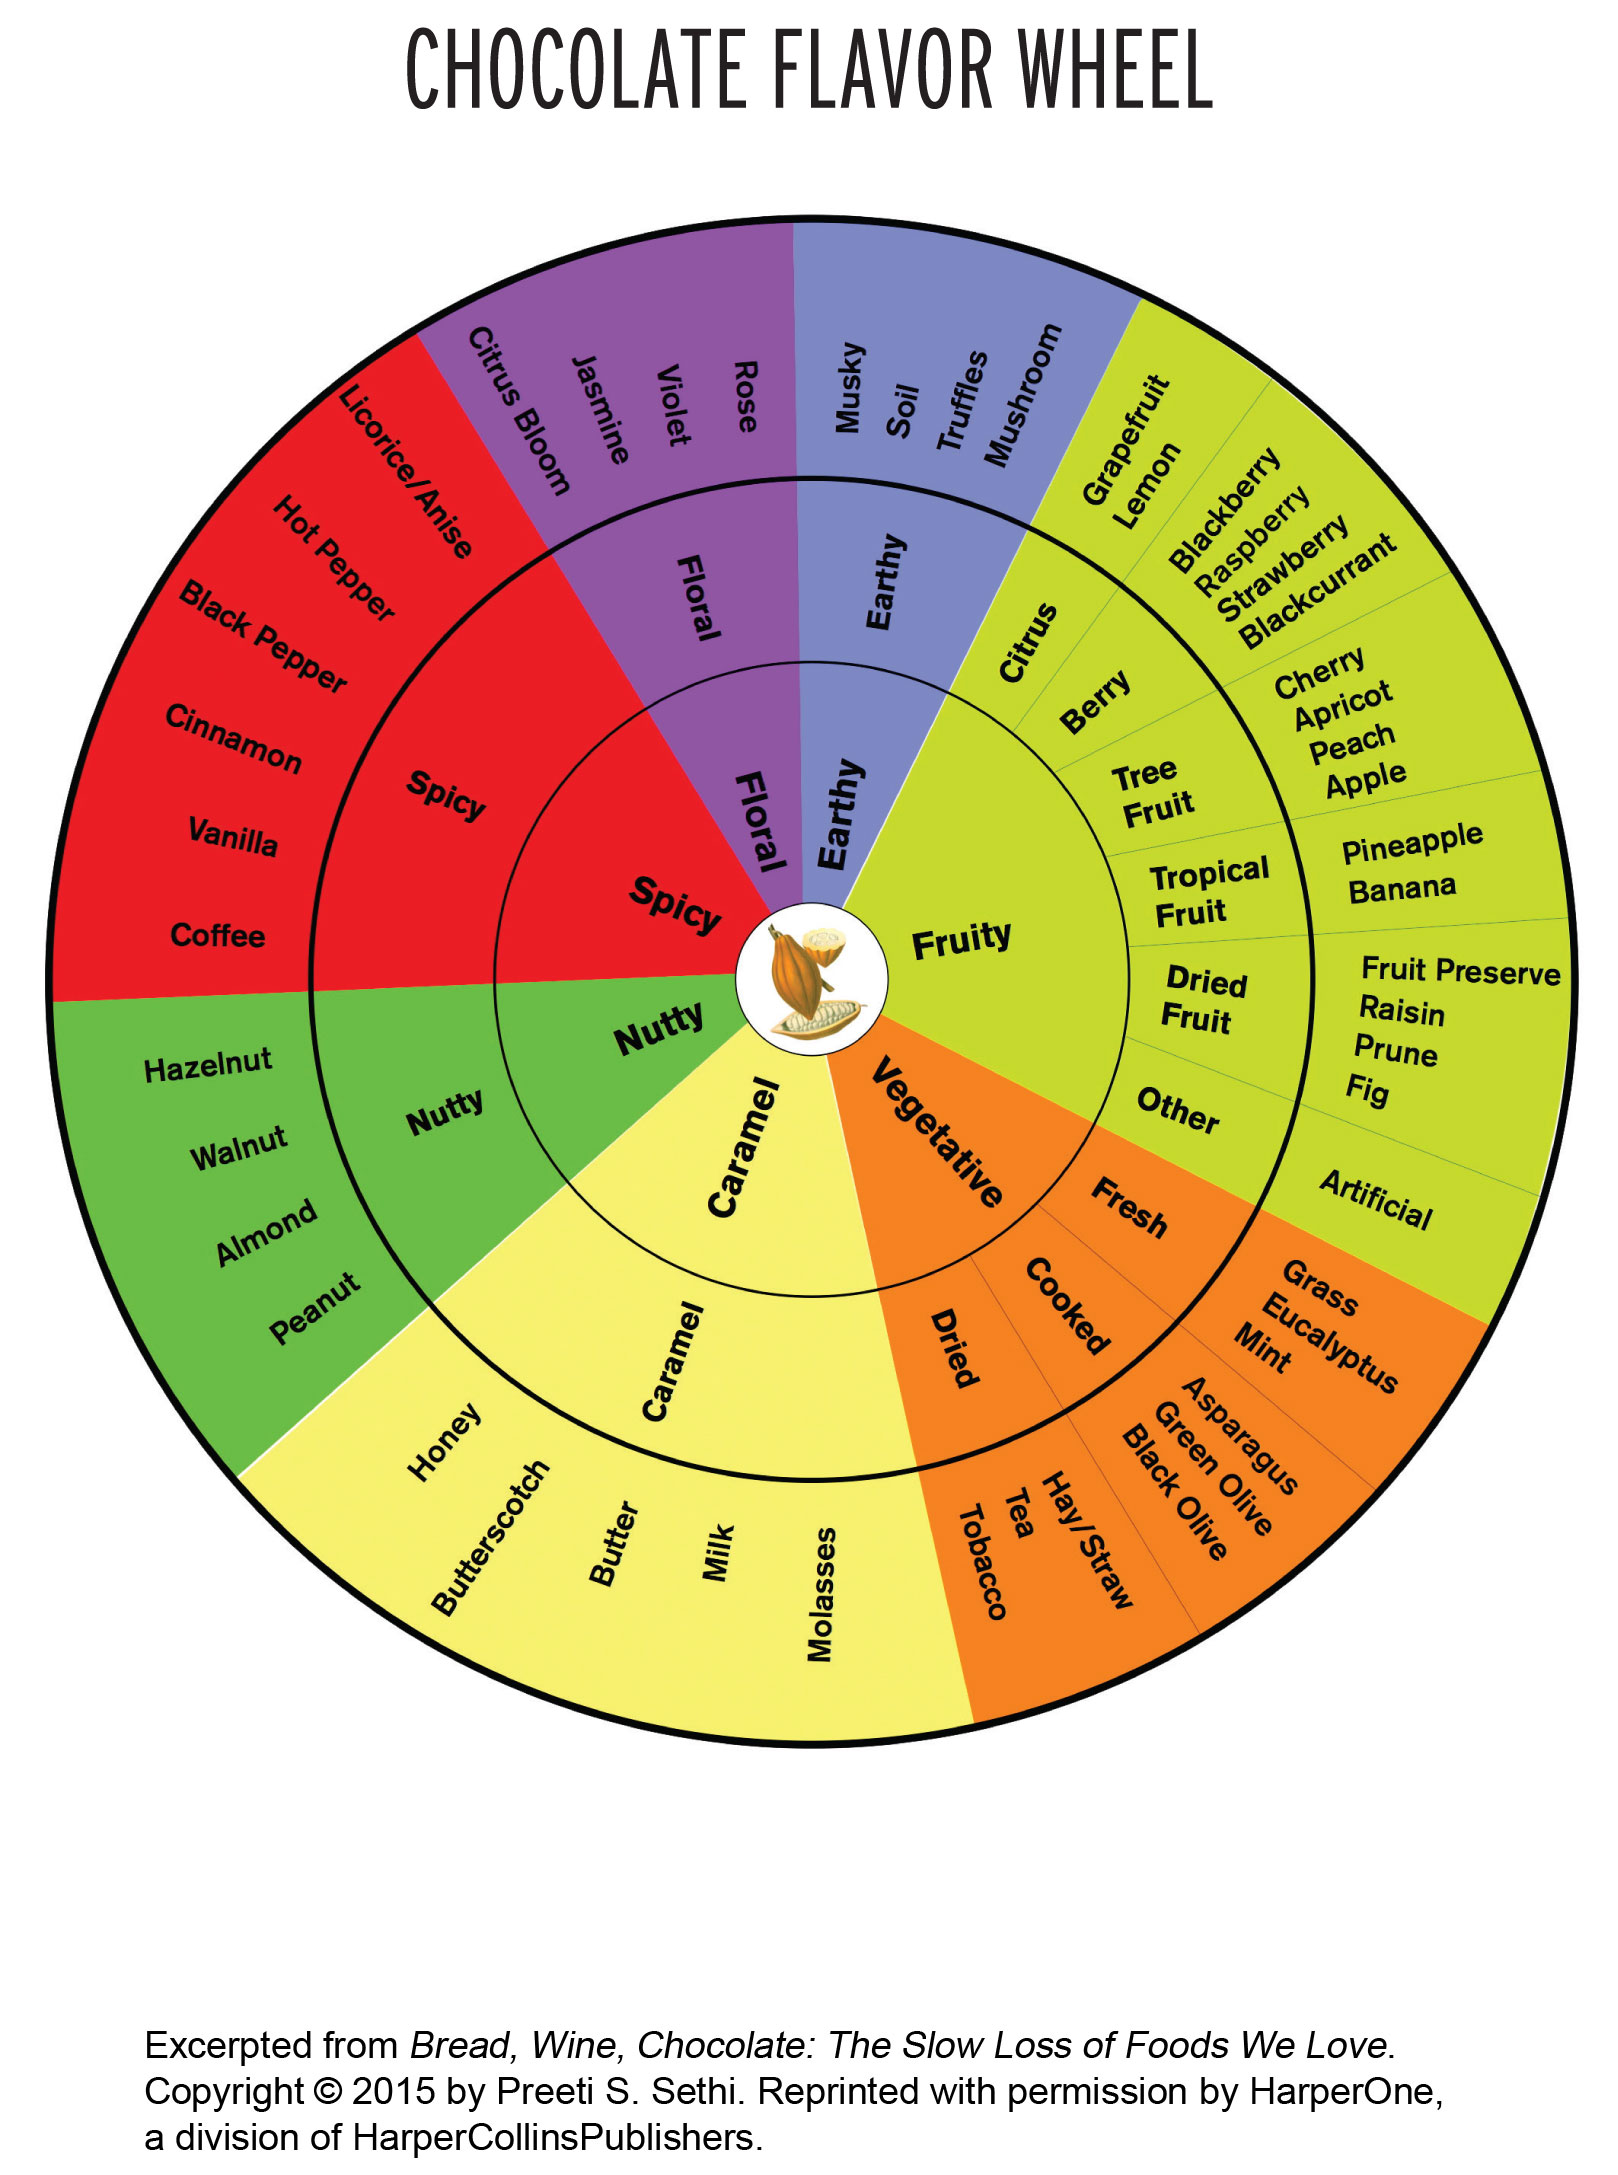 Chocolate Flavor Wheel